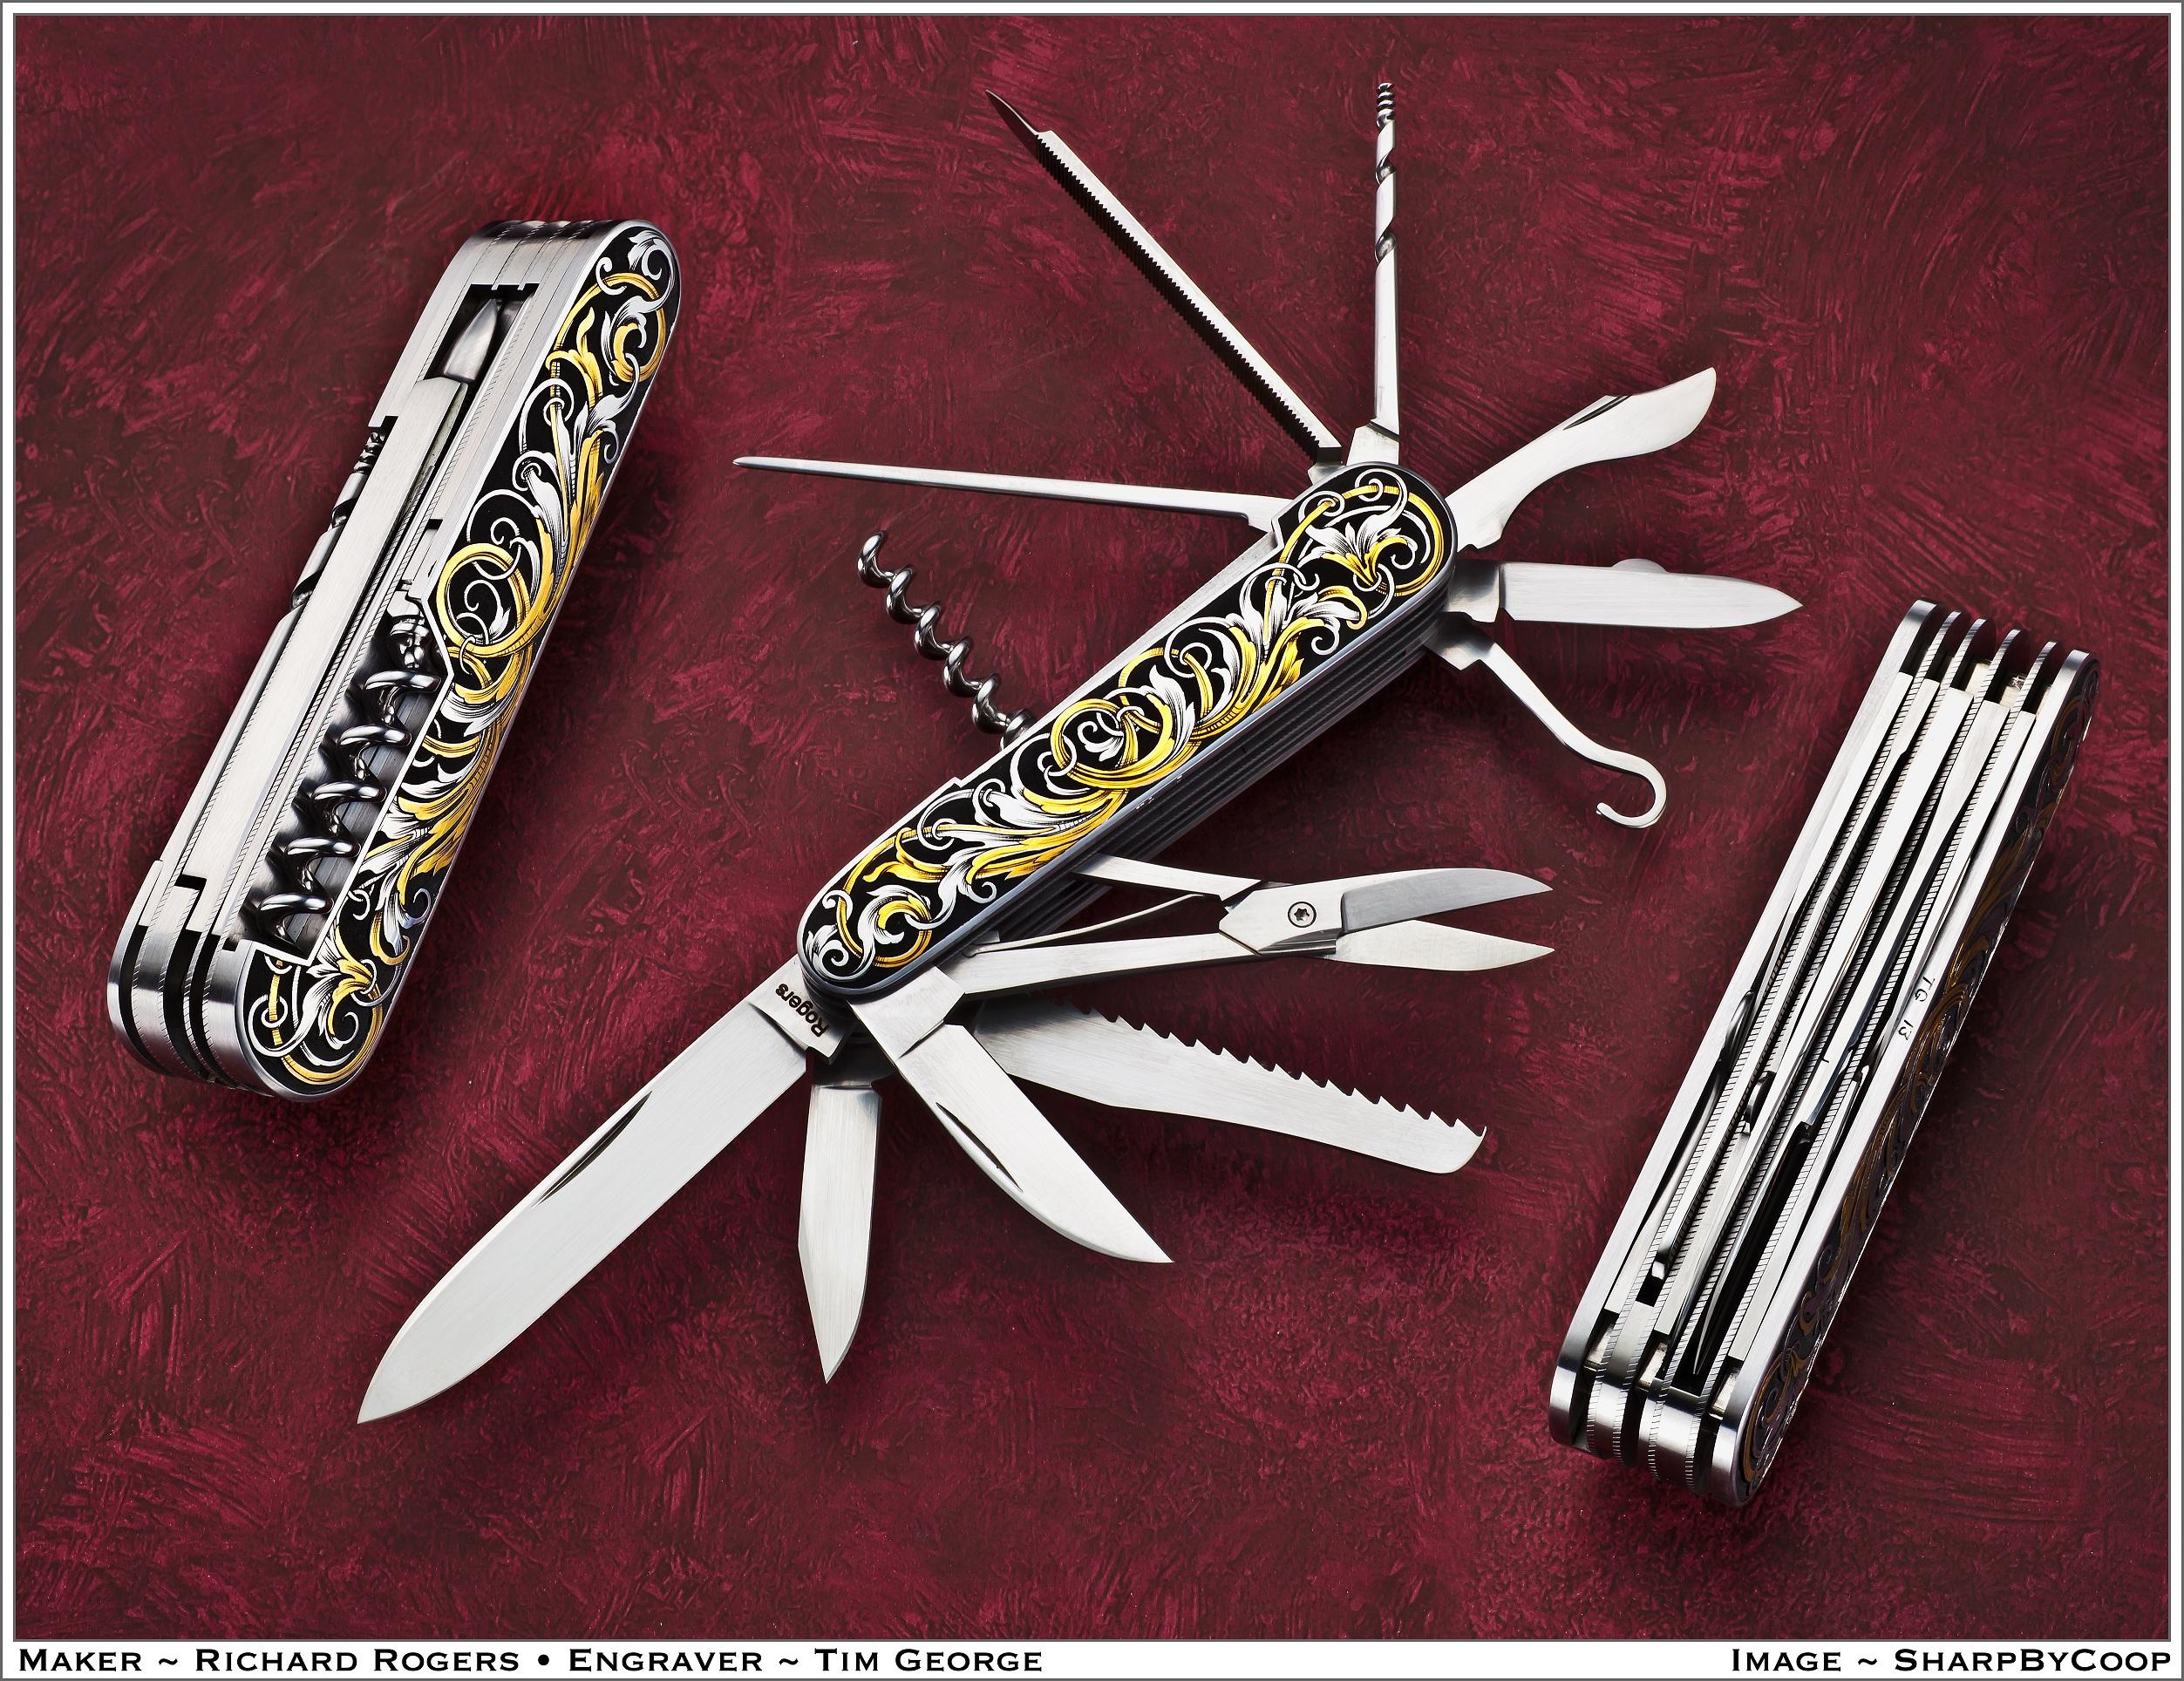 http://richardrogersknives.files.wordpress.com/2013/07/rogers-george-small2.jpg